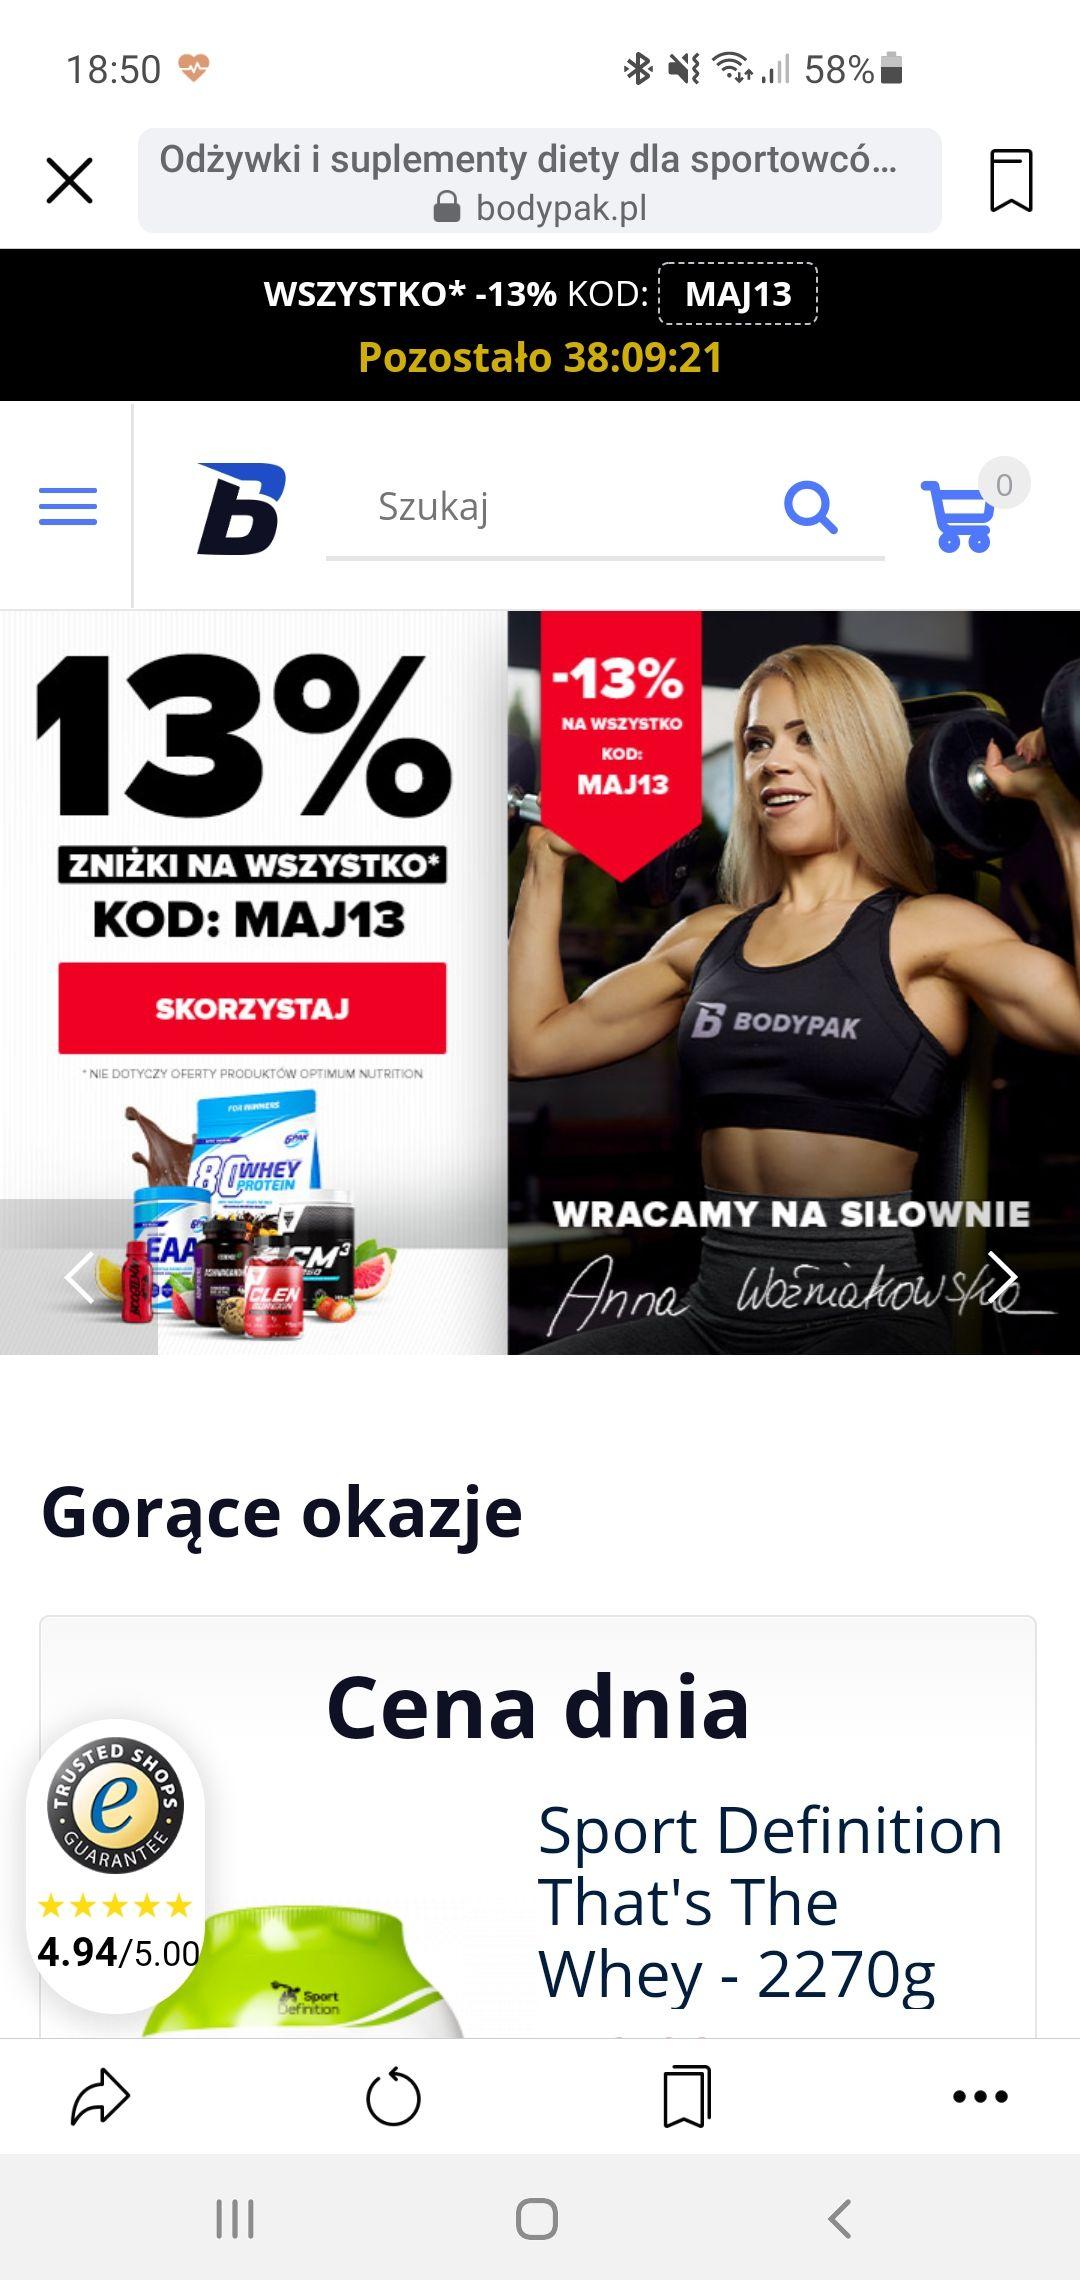 Suplementy na bodypack -13%